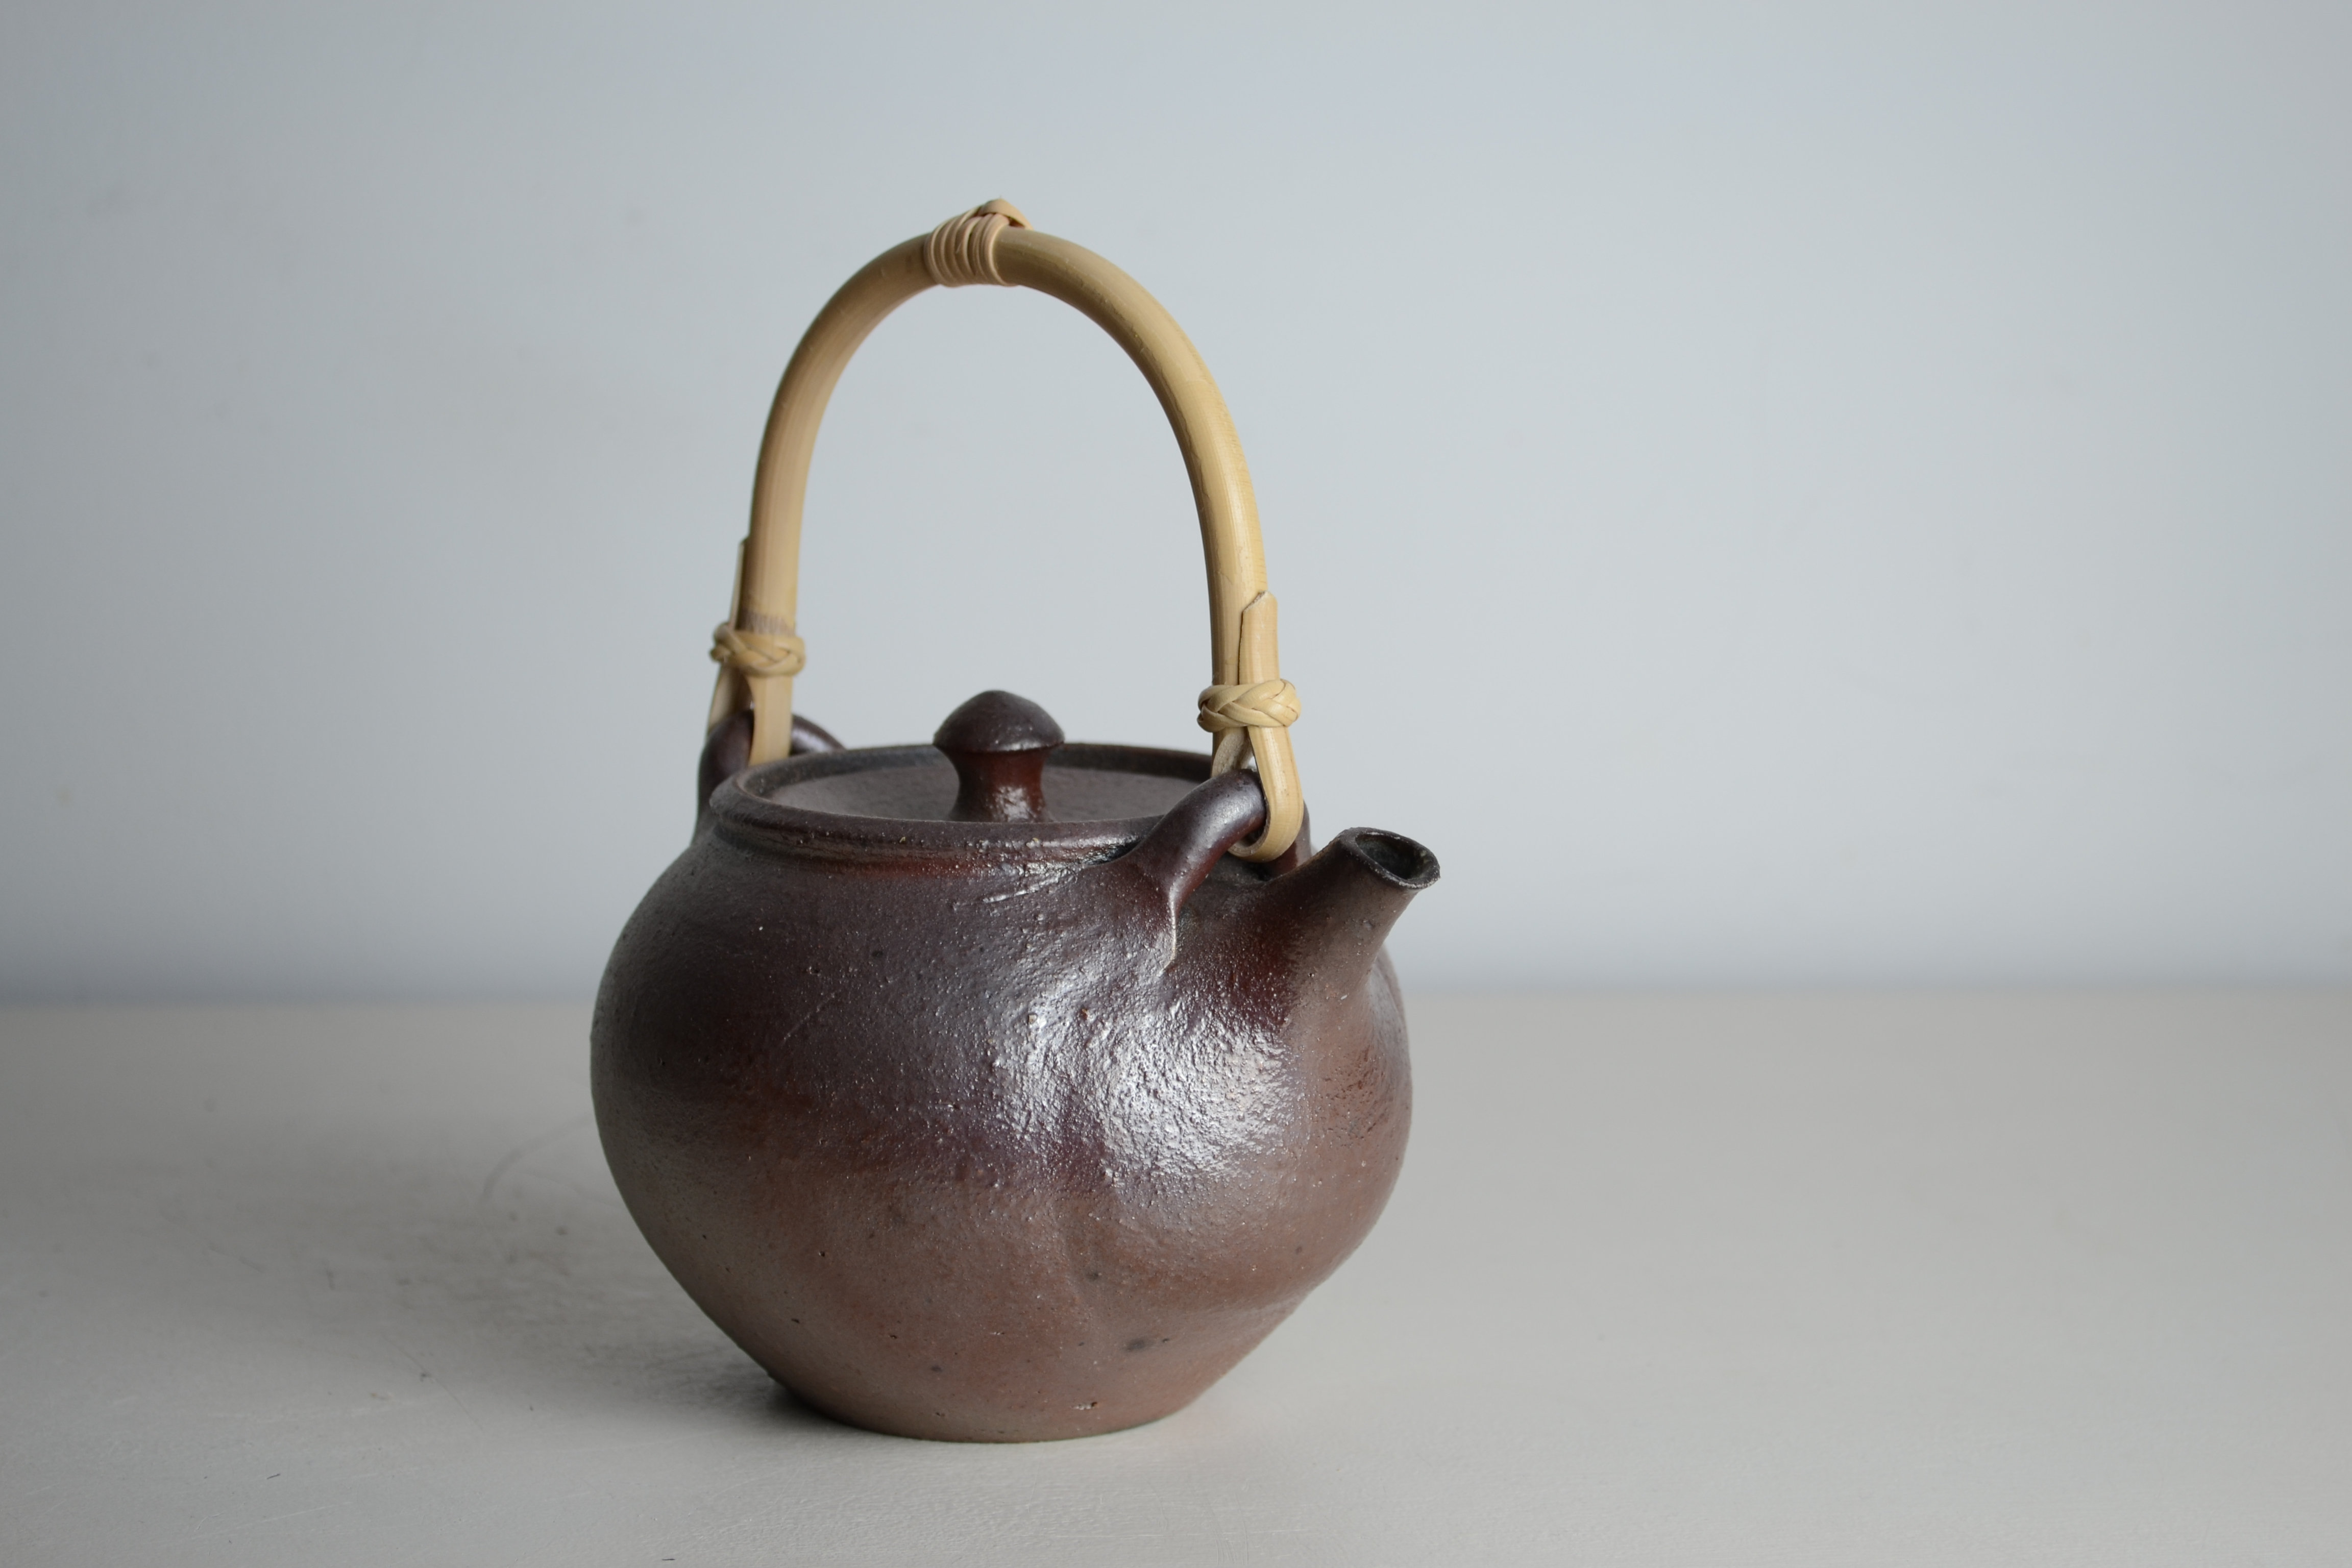 Teapot Unglazed Celadon Interior With Cane Handle Mysite